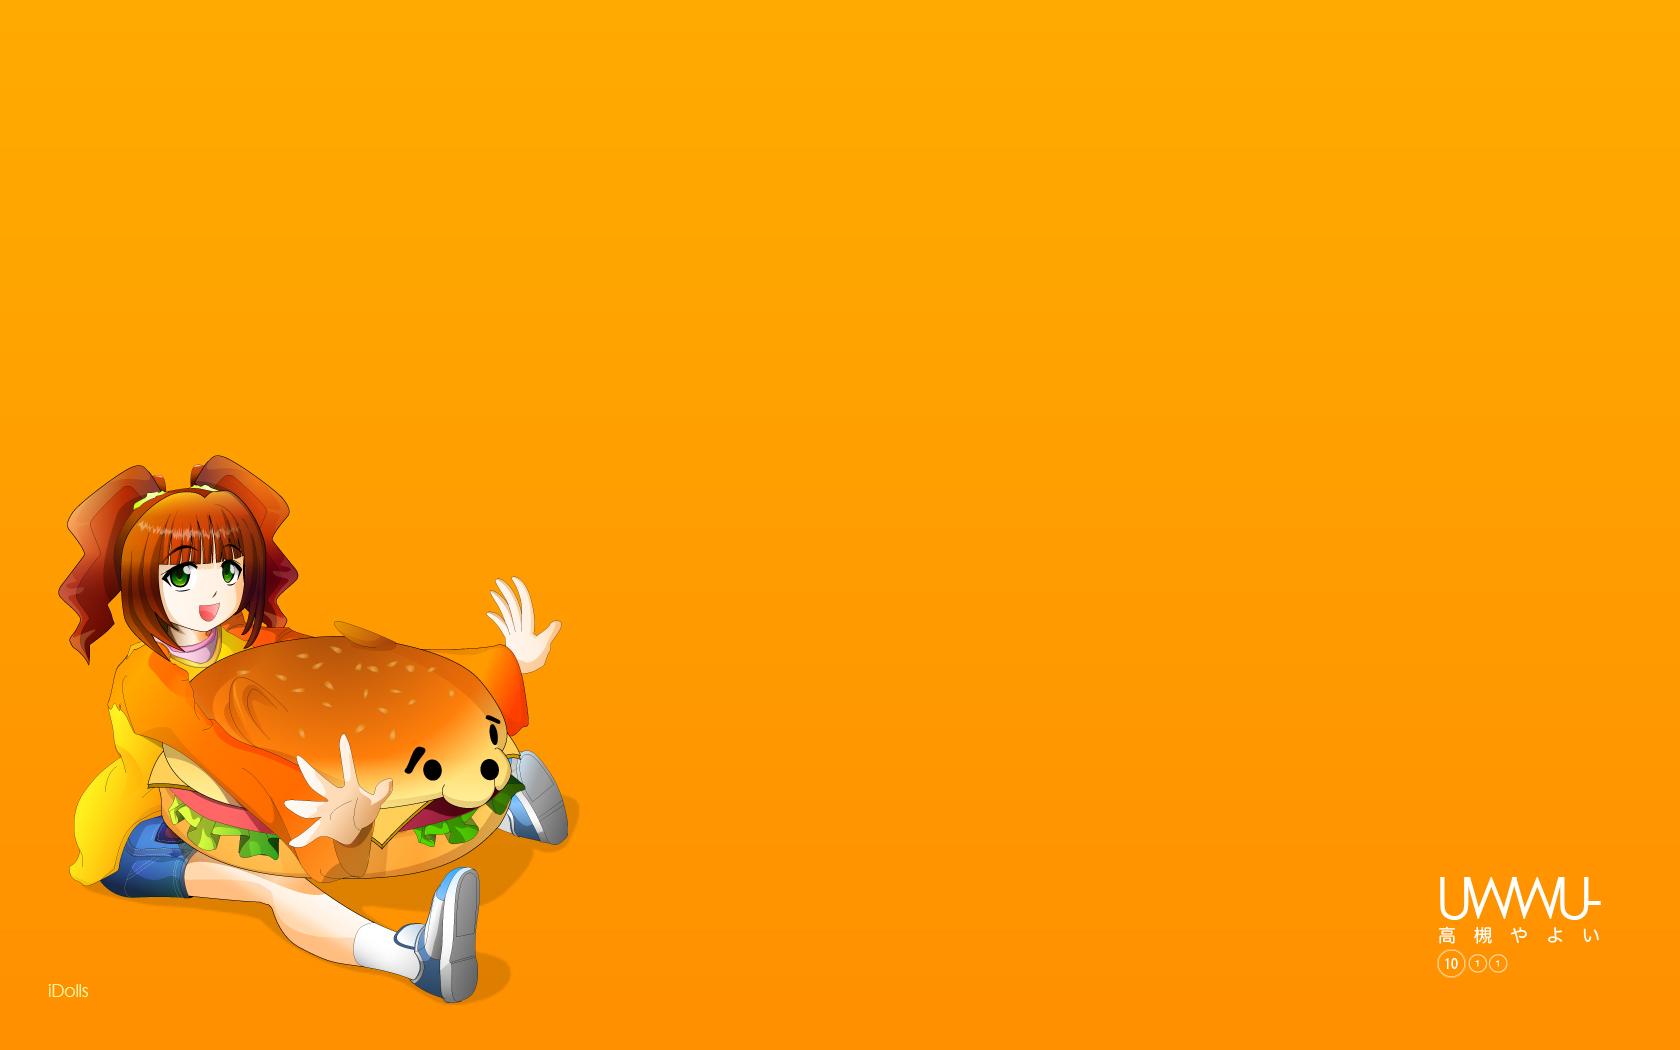 idolmaster orange takatsuki_yayoi